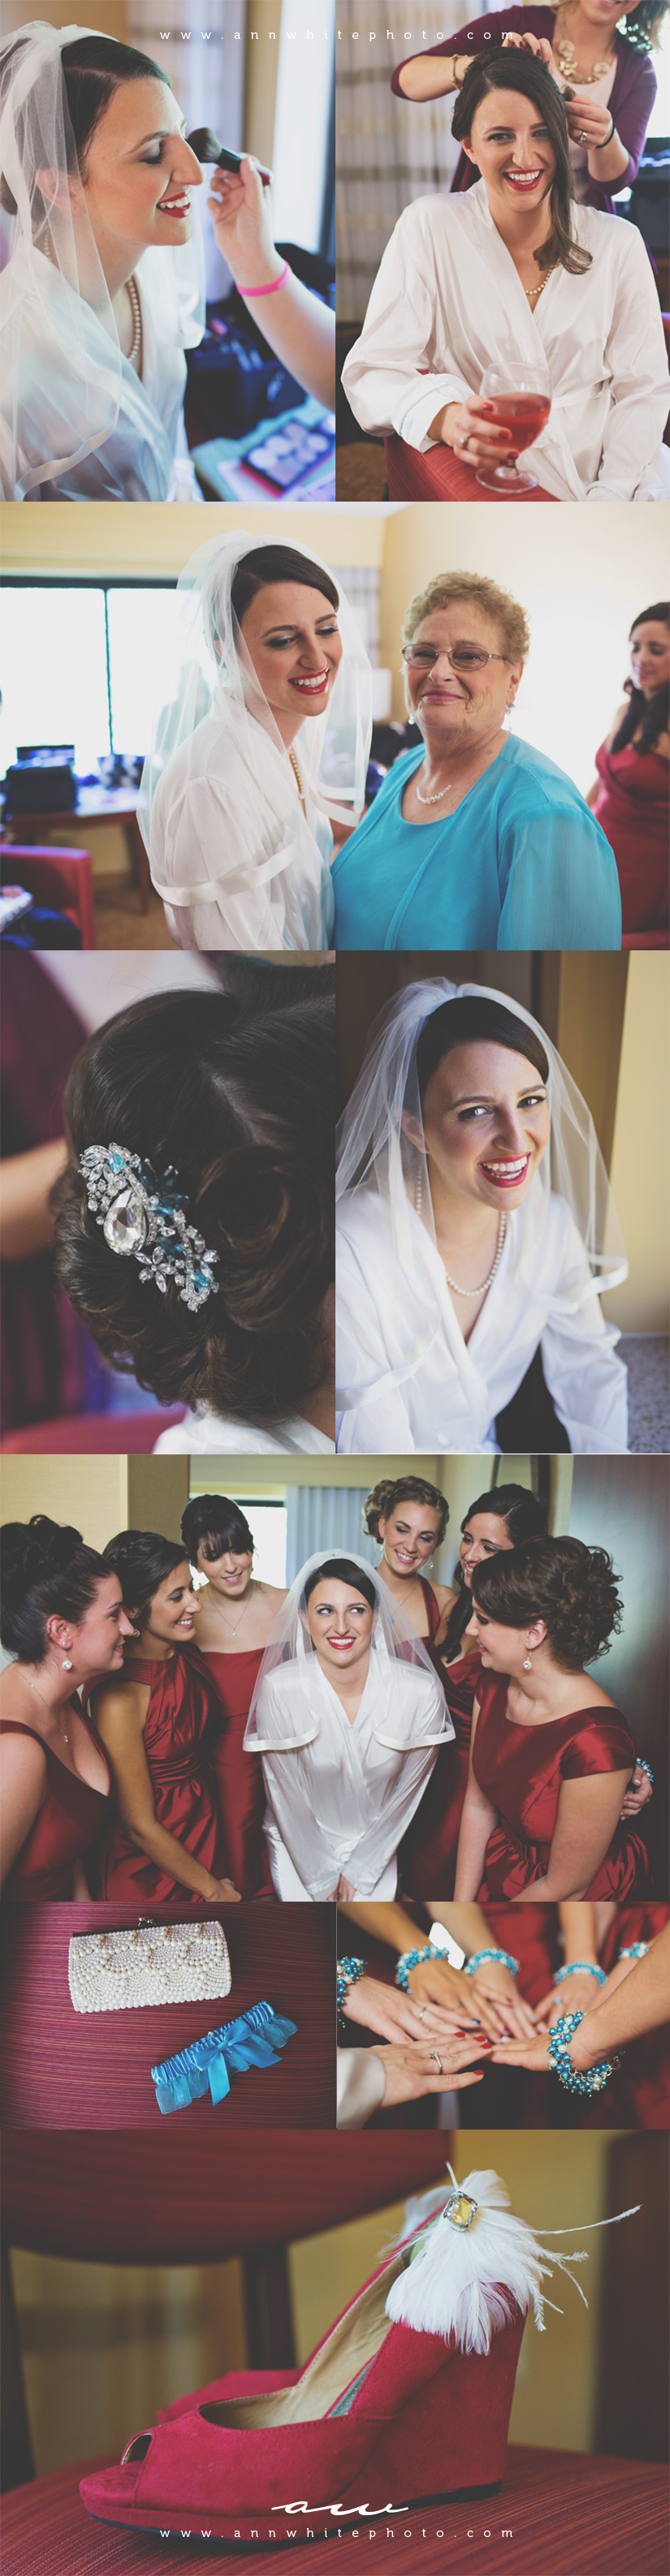 Vendors Wedding Planner Danielle Crumlish